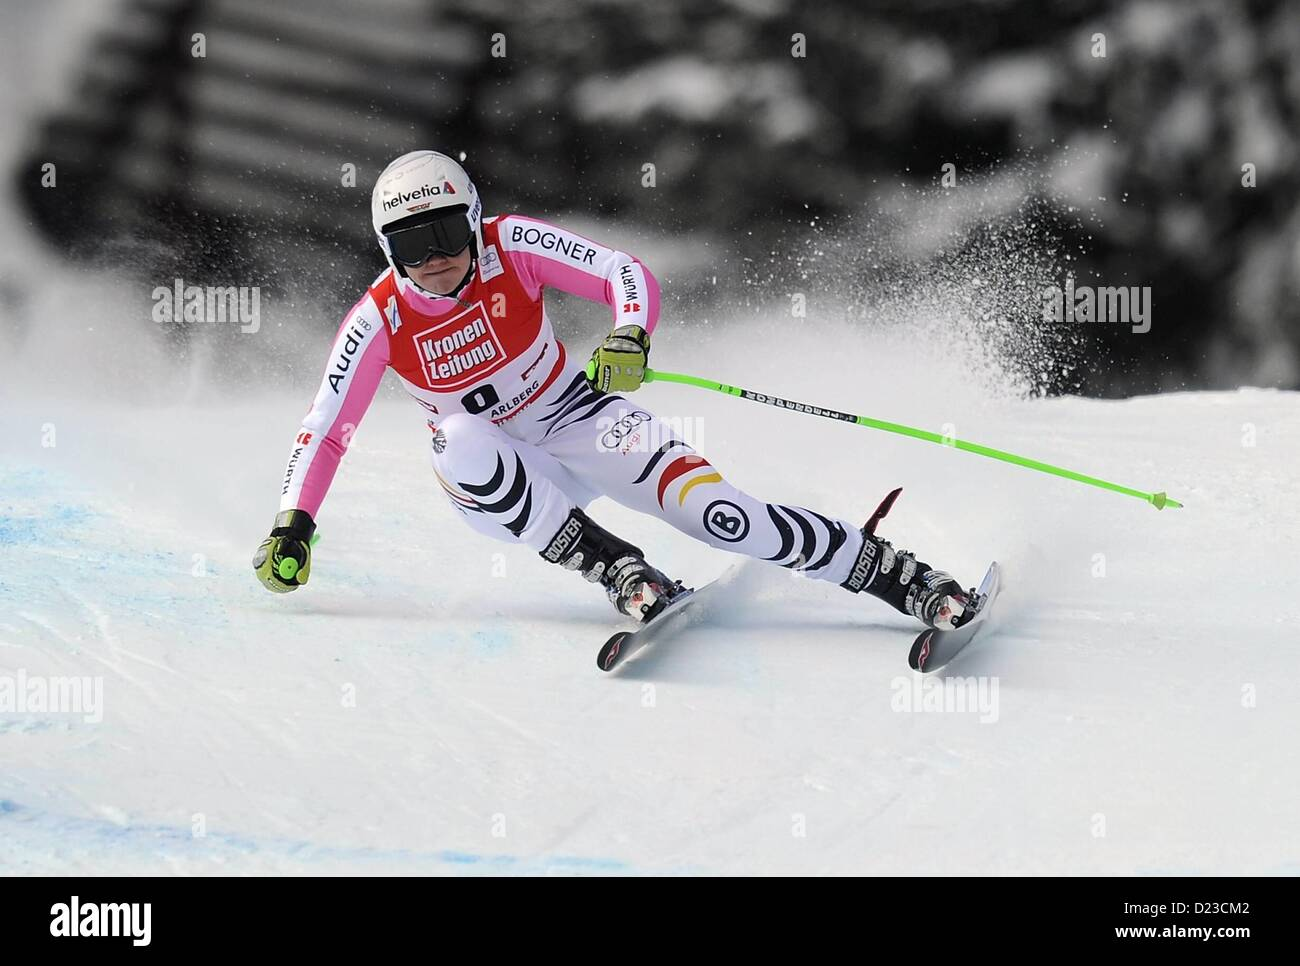 St Anton, Austria. 13th Jan, 2013.   Ski Alpine FIS World Cup Super G for women Viktoria Vinecastle ger - Stock Image